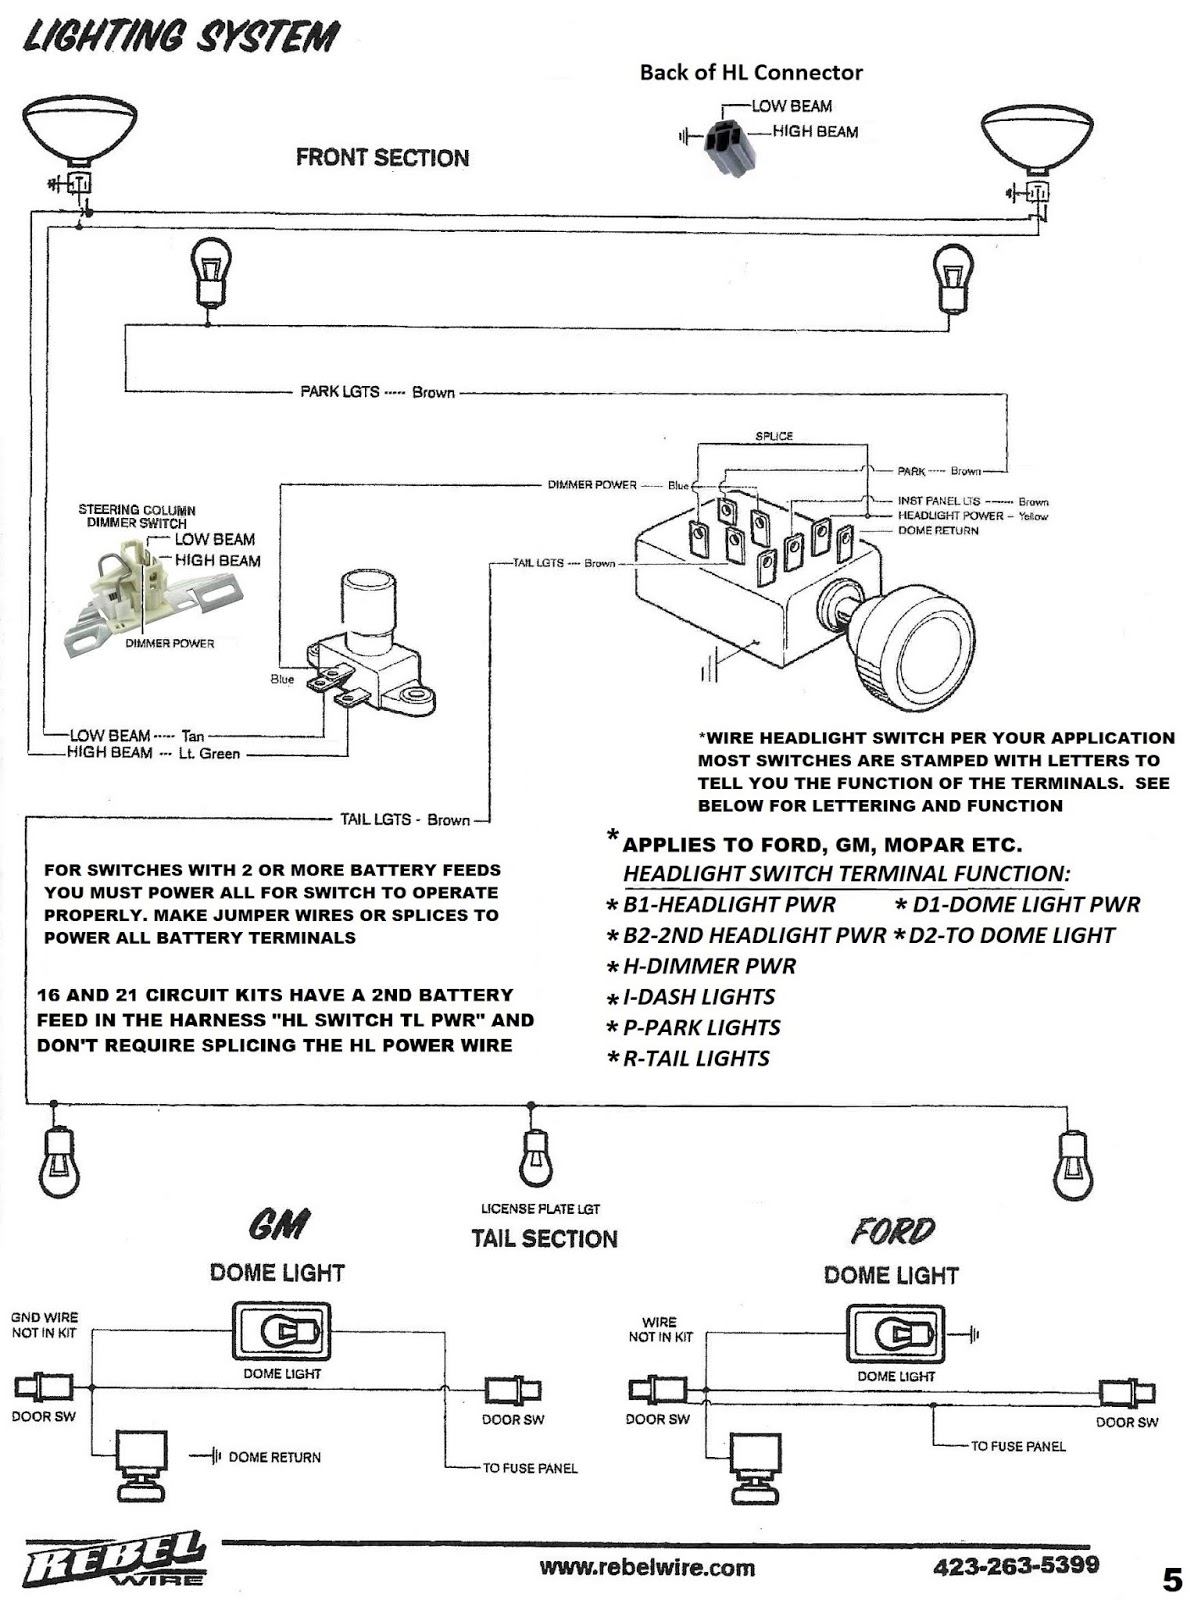 Mobilia  Dan U0026 39 S Motorcycle U0026quot Wiring Diagrams U0026quot Wiring Diagram Full